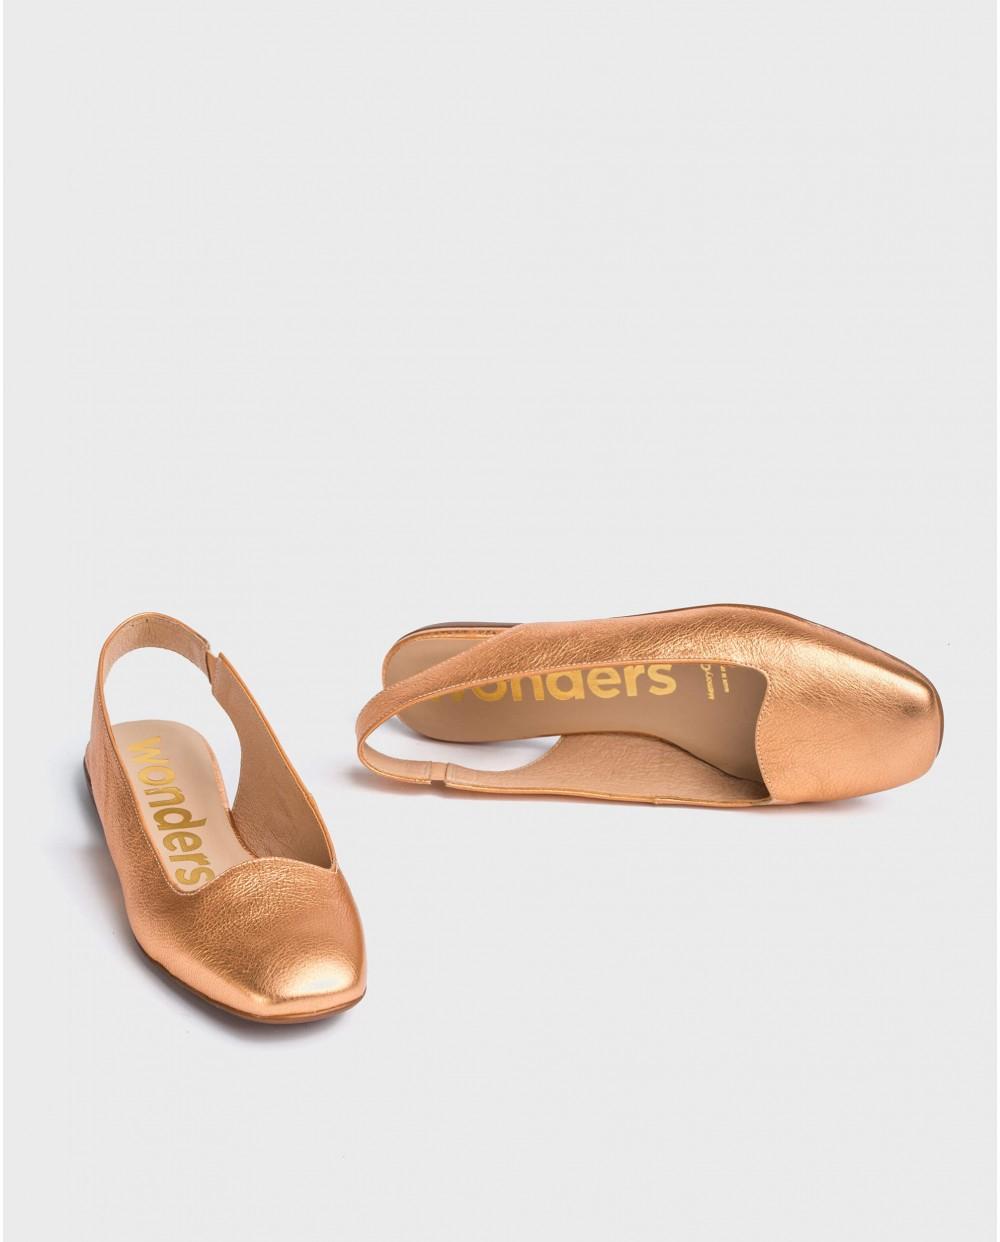 Wonders-Flat Shoes-Backless flat shoe